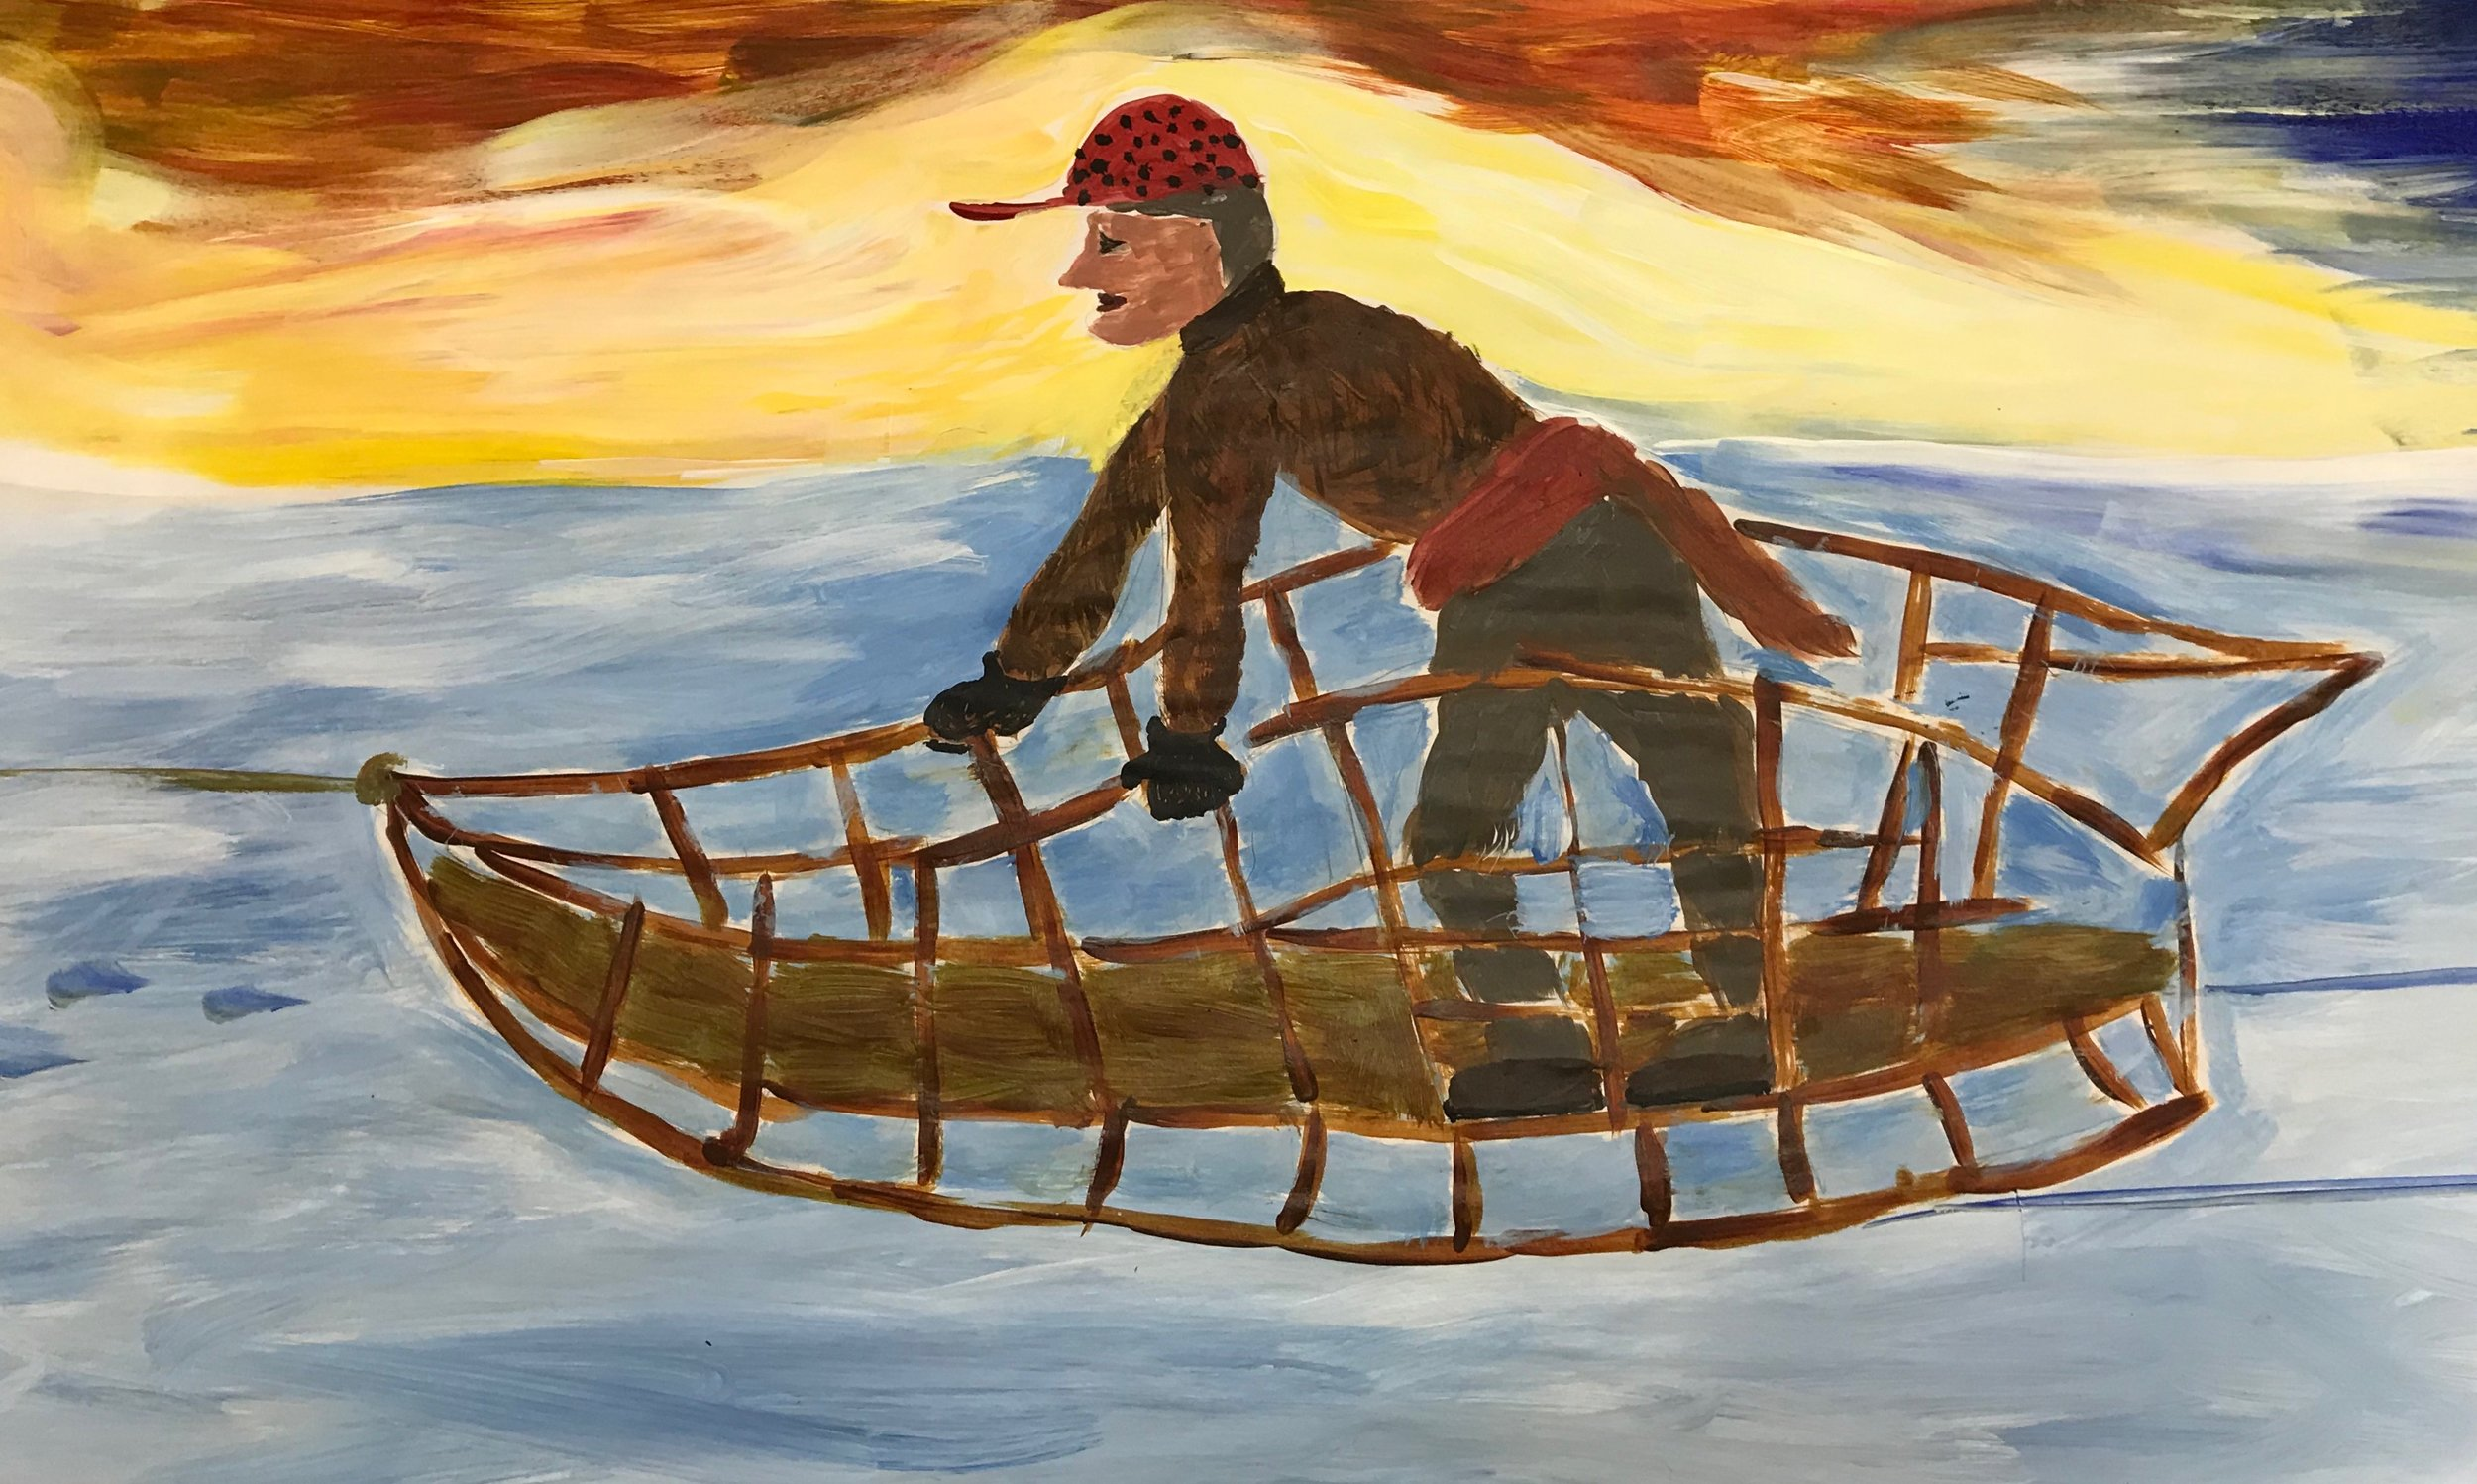 Arthur Walden as depicted in the Chocorua Lake Crankie. Credit: Chocorua Lake Crankie artists